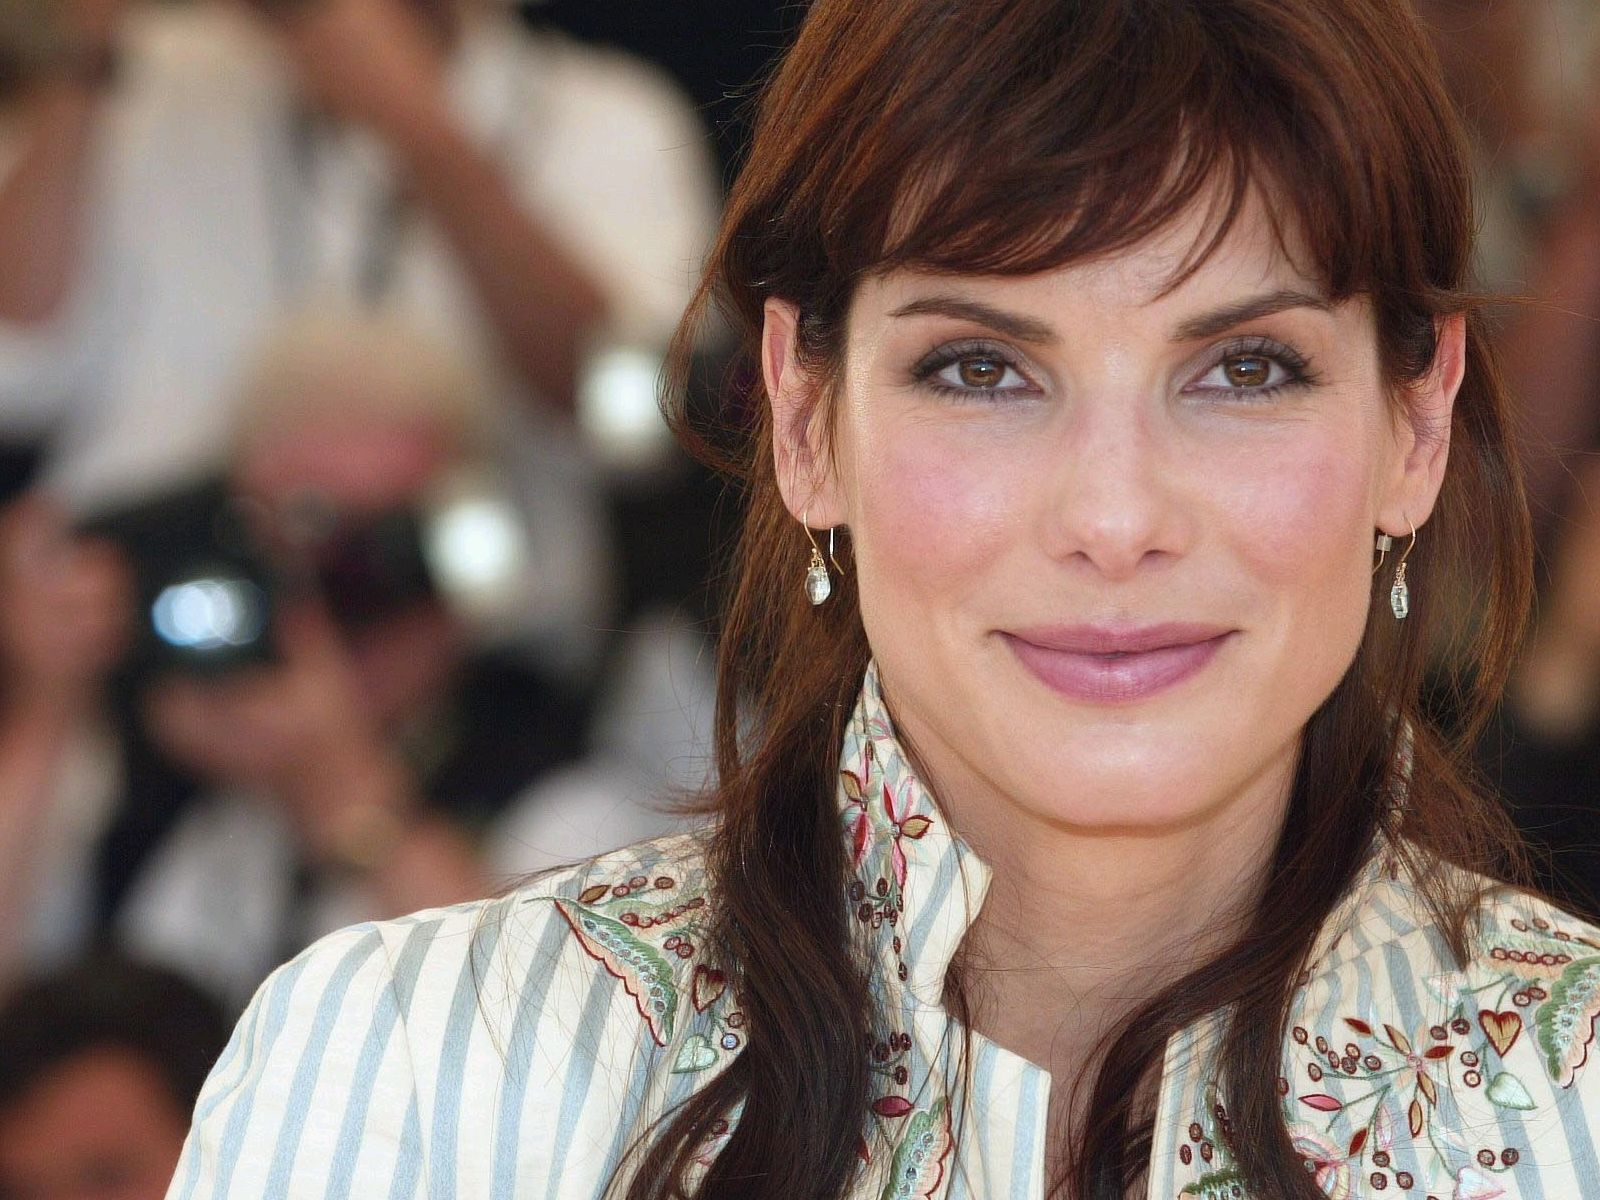 http://3.bp.blogspot.com/-L34qr6203XU/Tow0ba_rkCI/AAAAAAAAAGk/twZ5ONjnrFU/s1600/Sandra_Bullock_Wallpapers-Beauty.jpg